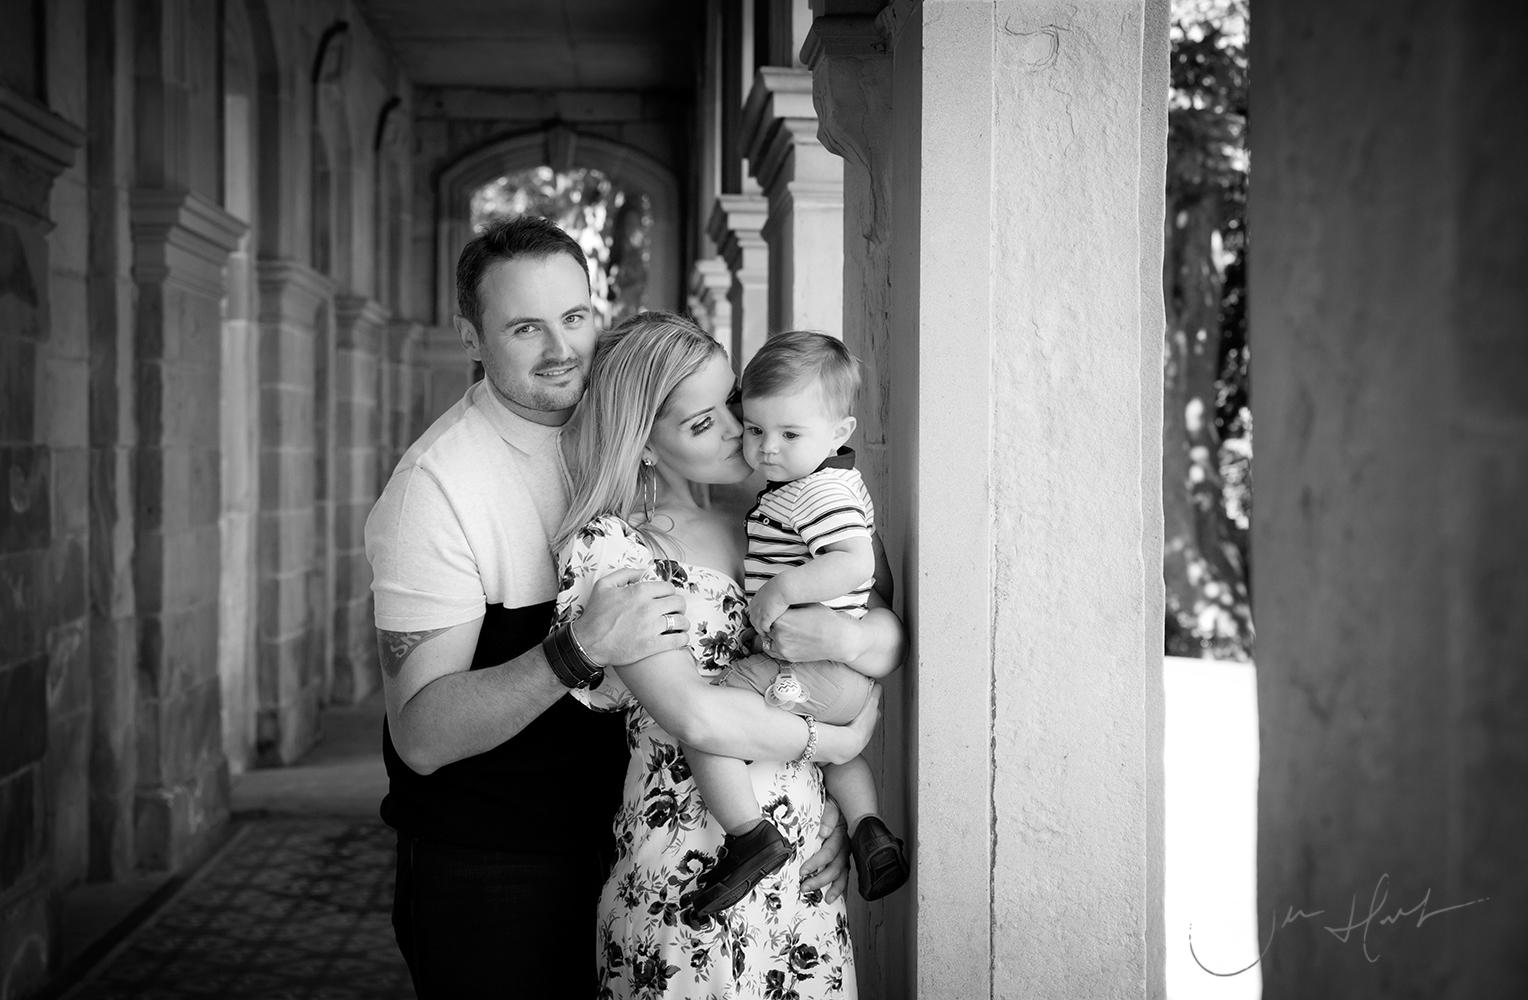 Family-Outdoor-Photography-Stewart-Park-Jen-Hart-Sophie-Alan-09June17_023